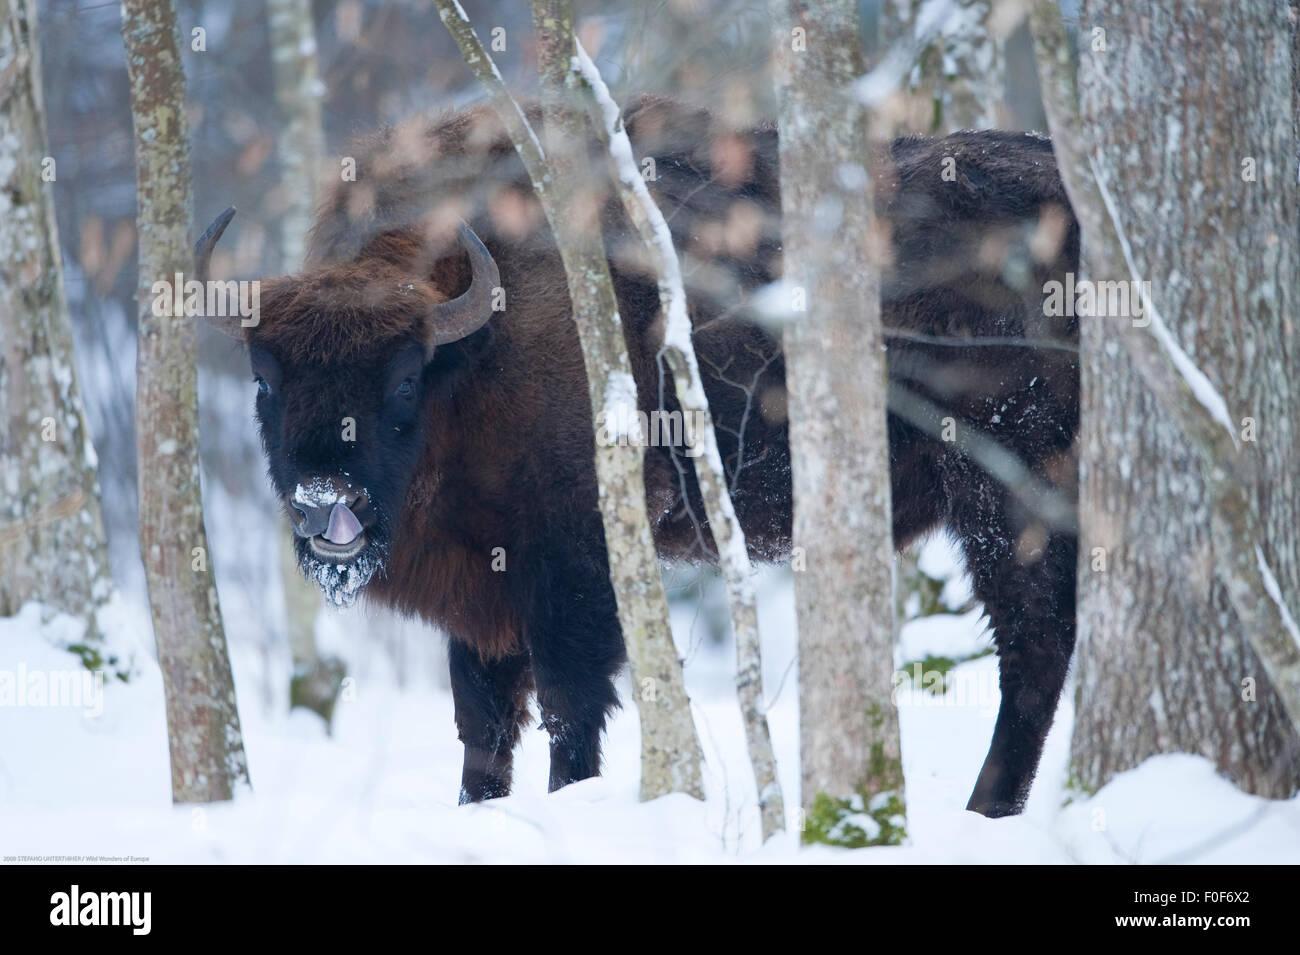 European bison (Bison bonasus) licking nose, Bialowieza NP, Poland, February 2009 - Stock Image